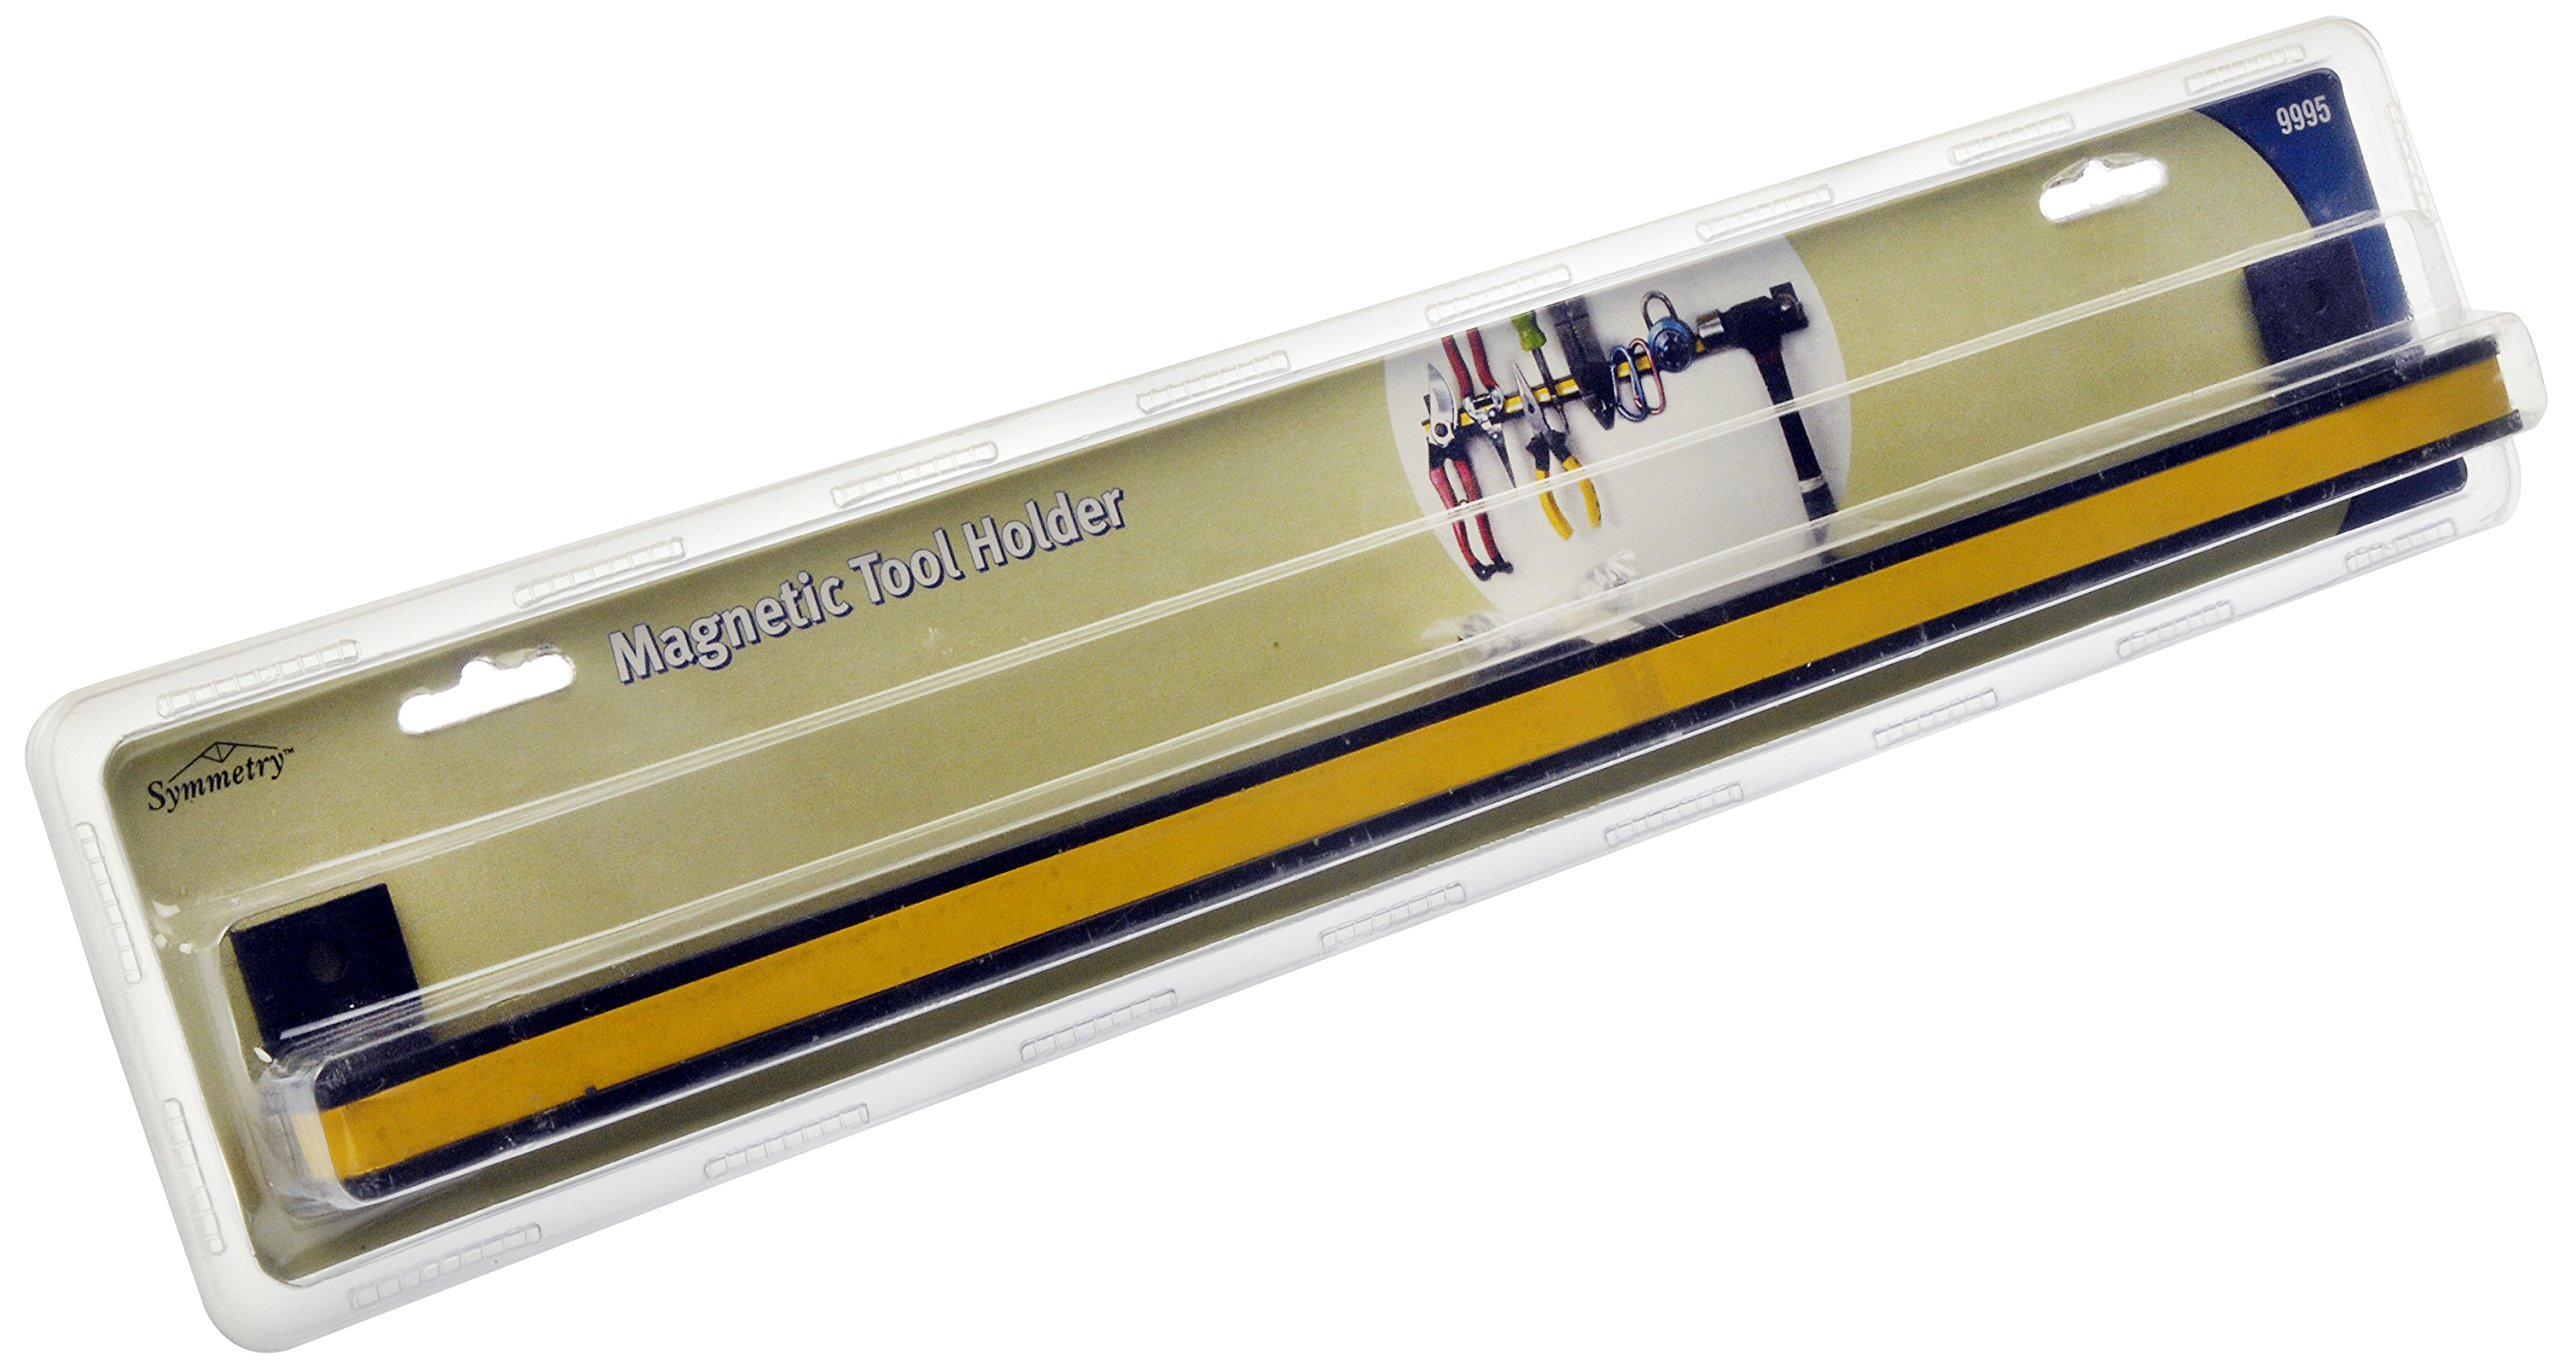 Dorman Hardware 4-9995 Magnetic Tool Bar, 16 Inch by Dorman Hardware (Image #2)